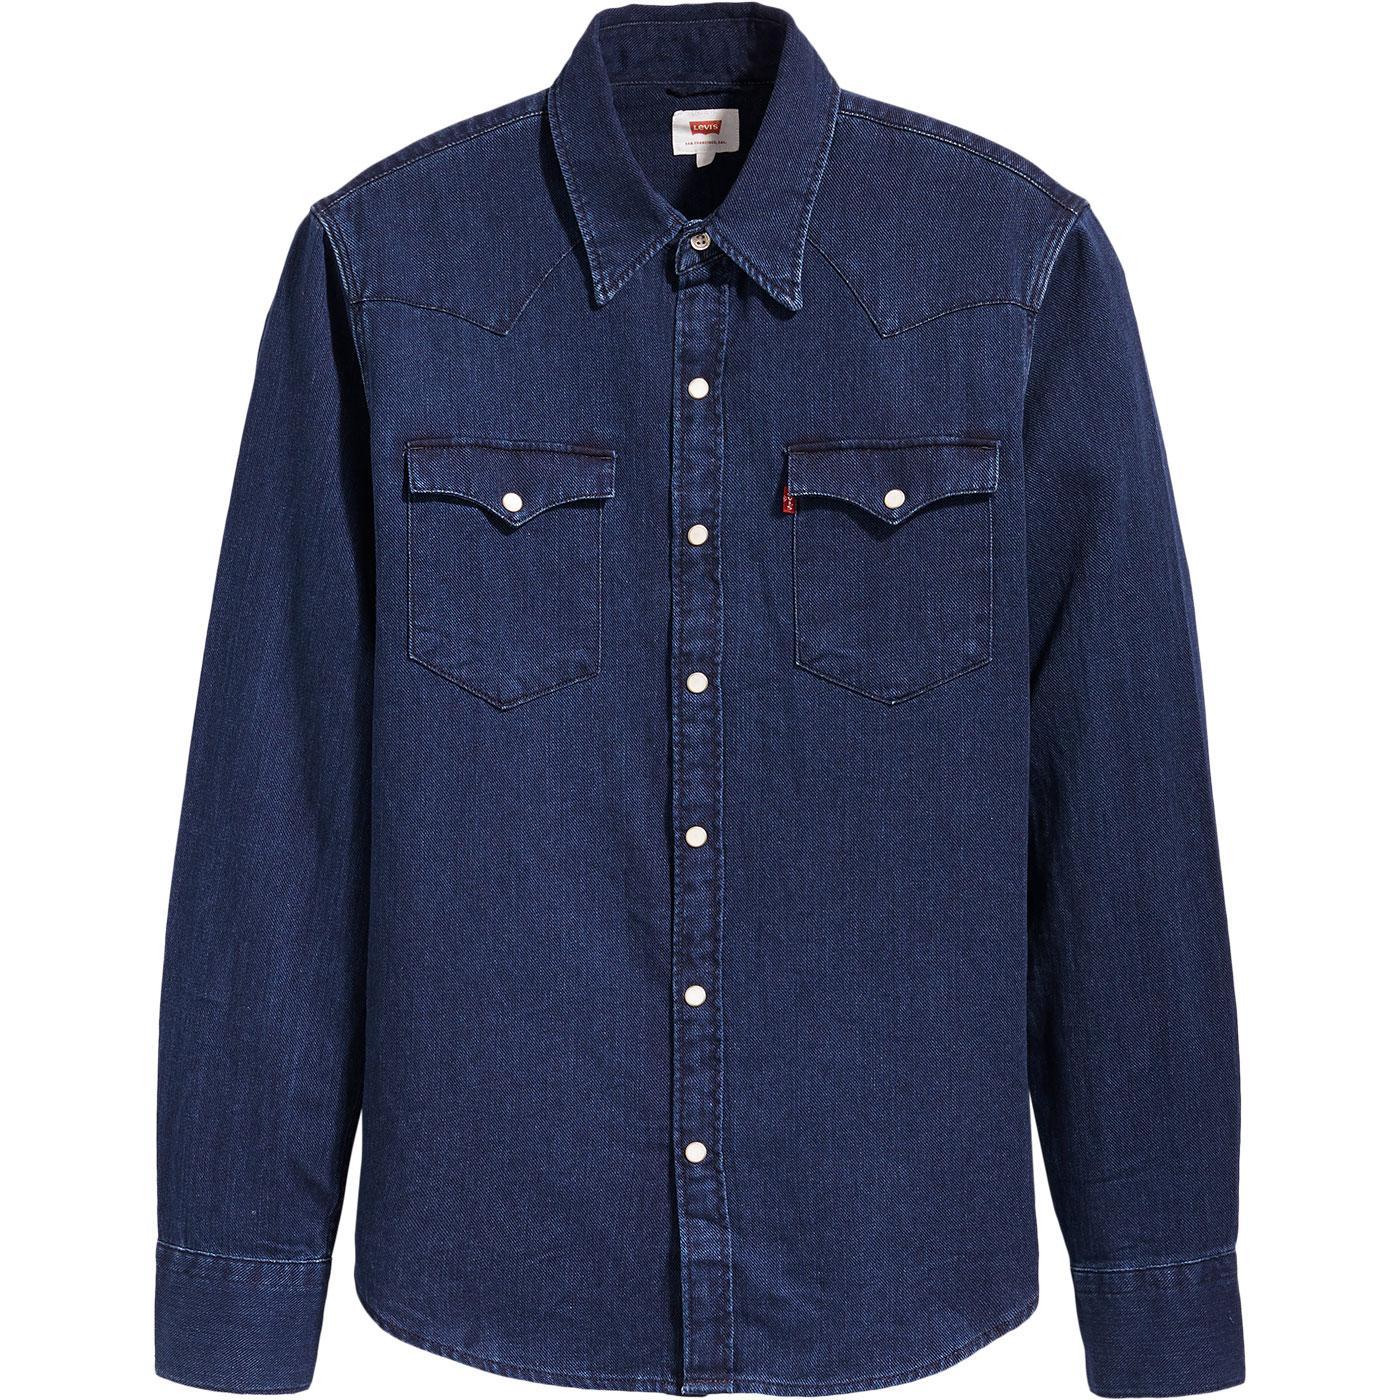 Barstow LEVI'S Retro Indigo Flannel Western Shirt